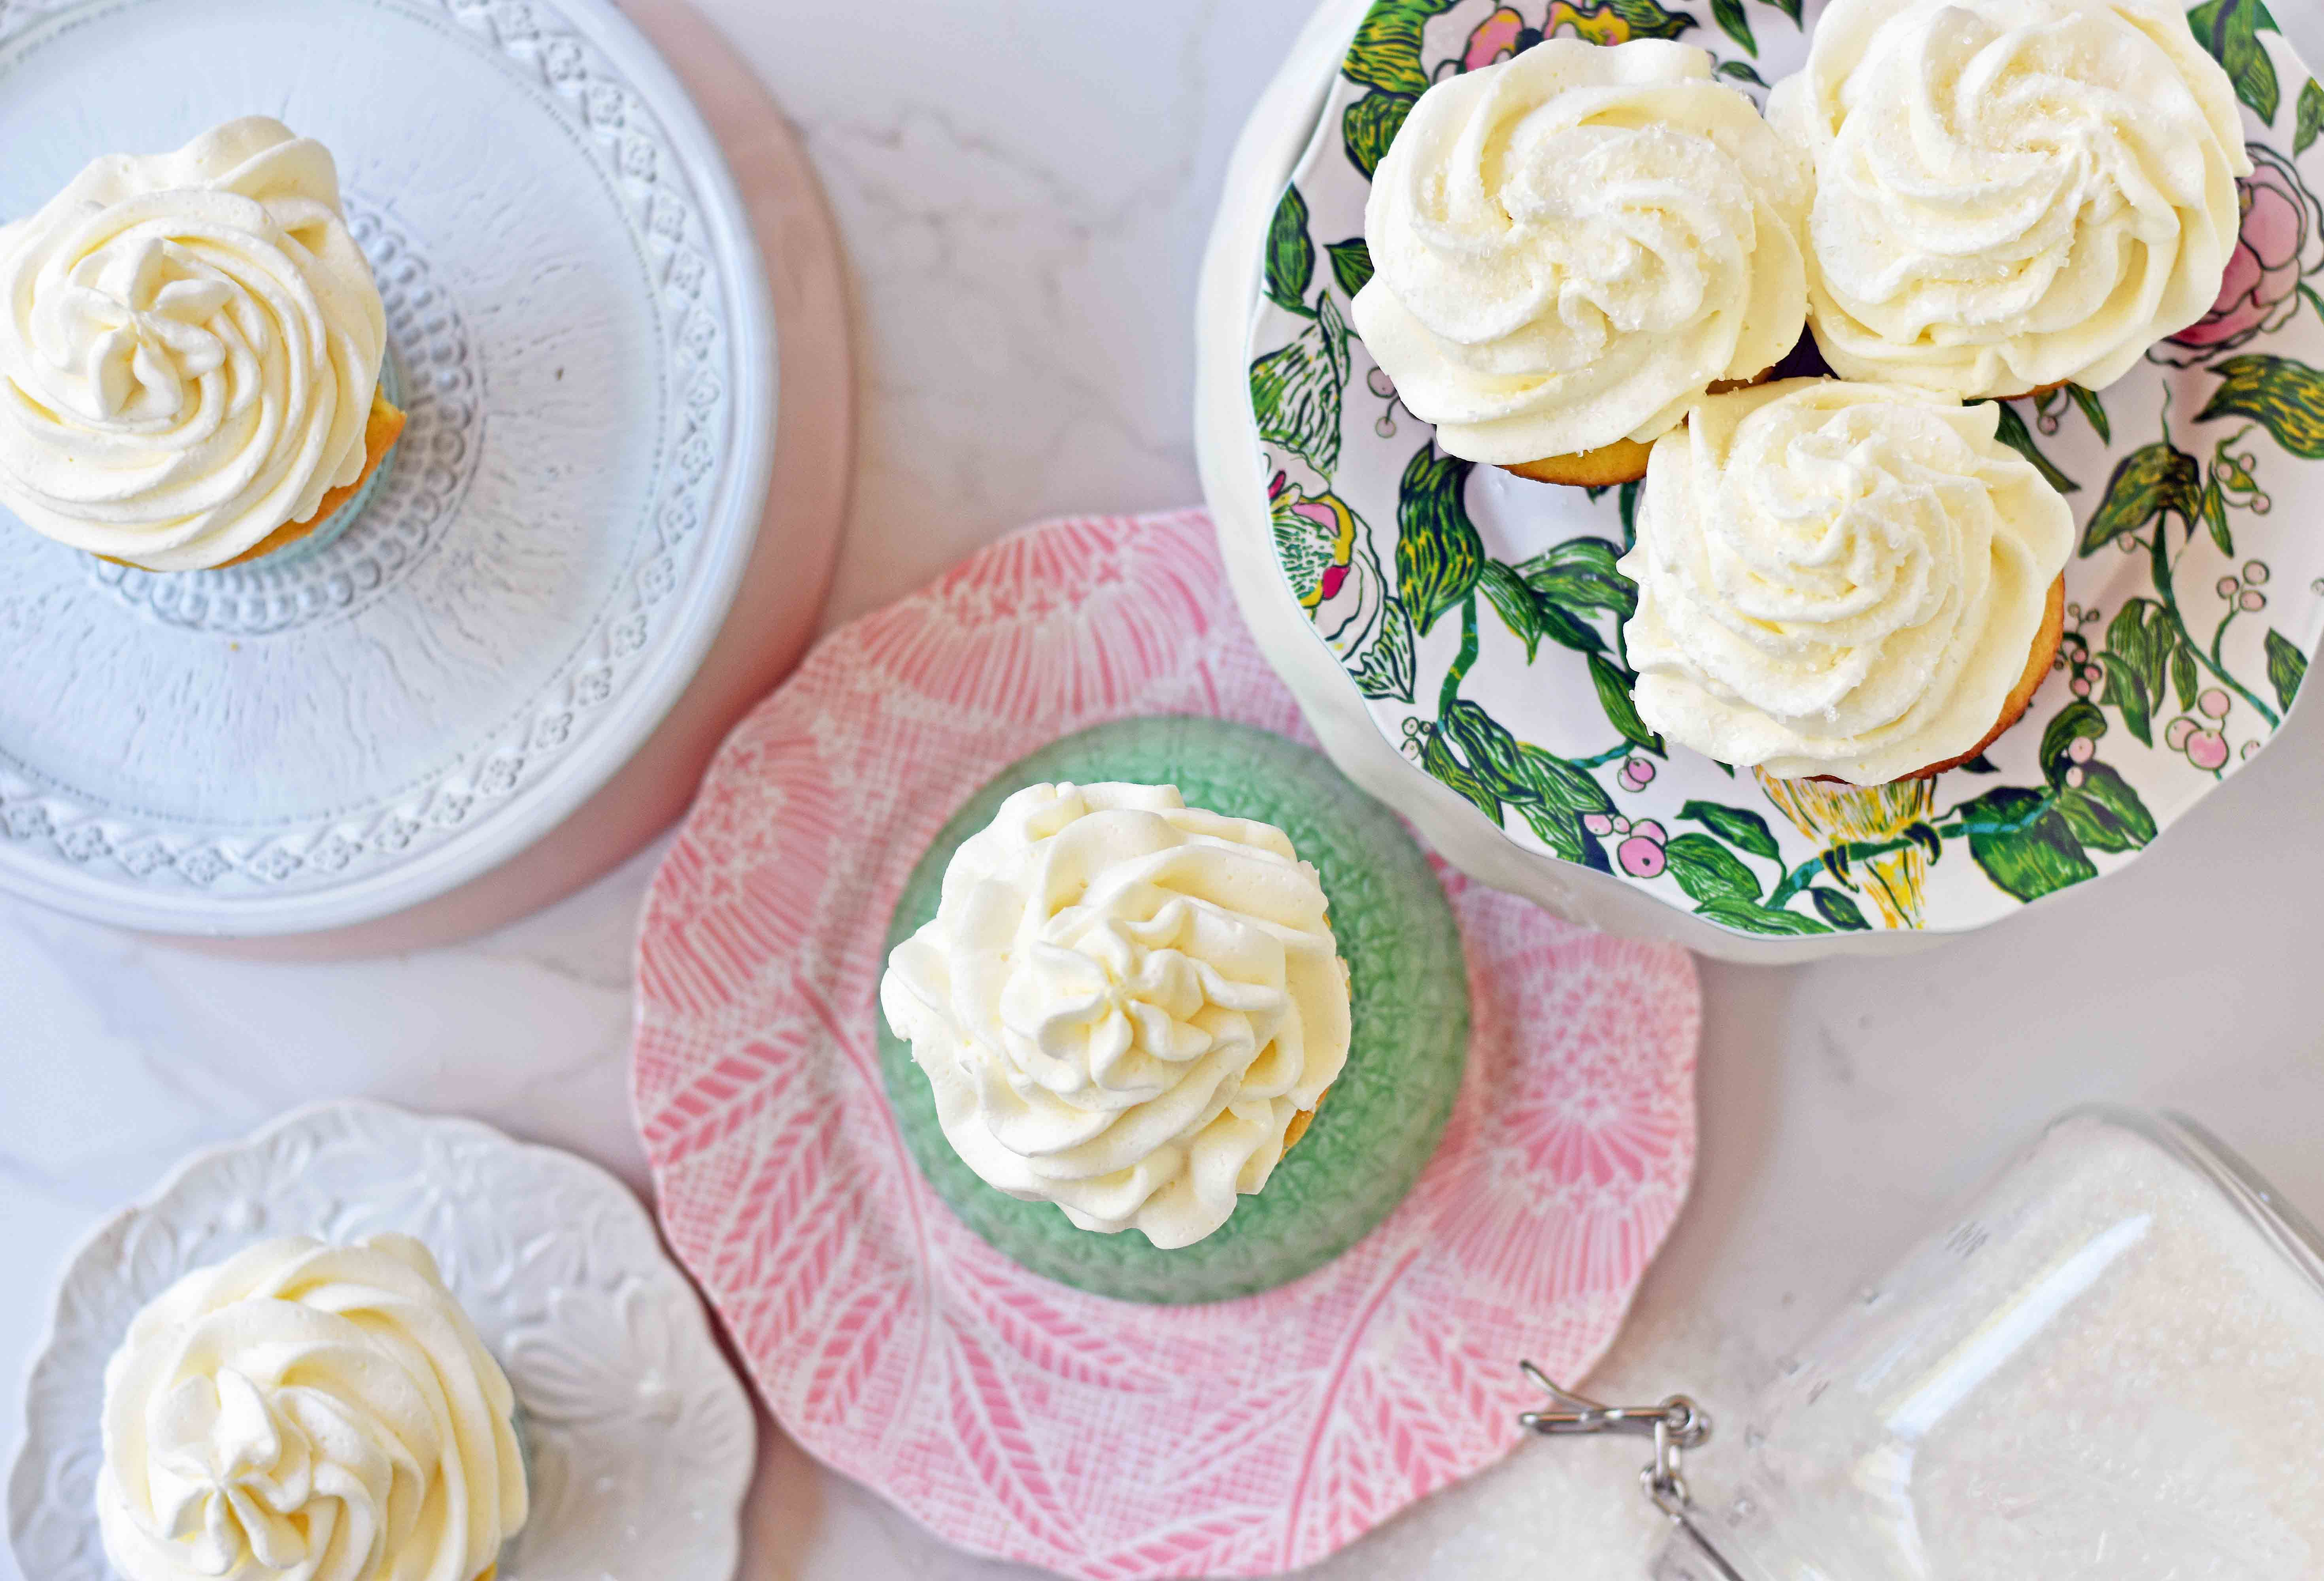 Best Vanilla Cupcakes Recipe. How to make soft and moist vanilla cupcakes. Homemade Vanilla Cupcakes with Vanilla Buttercream Frosting. www.modernhoney.com